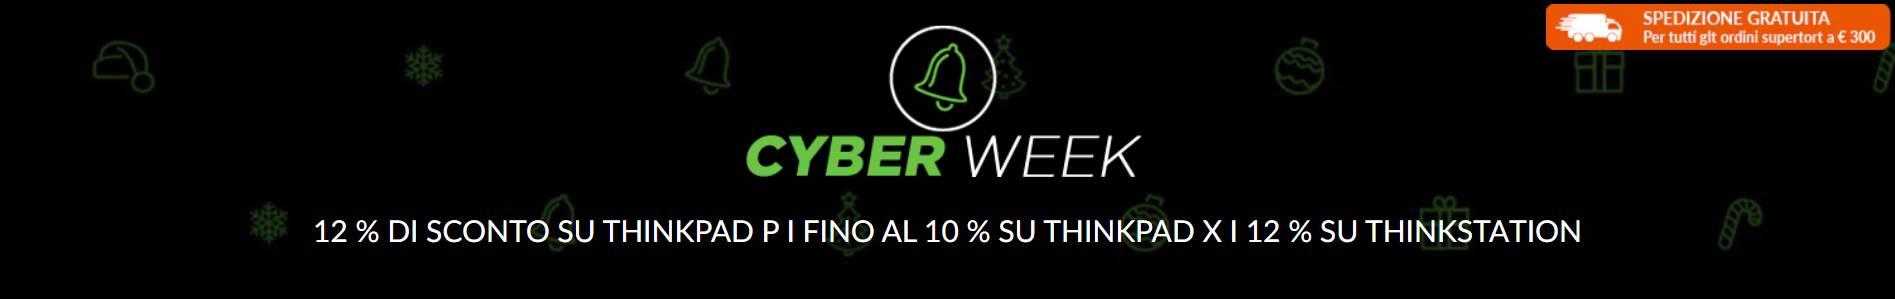 Lenovo Cyber Week